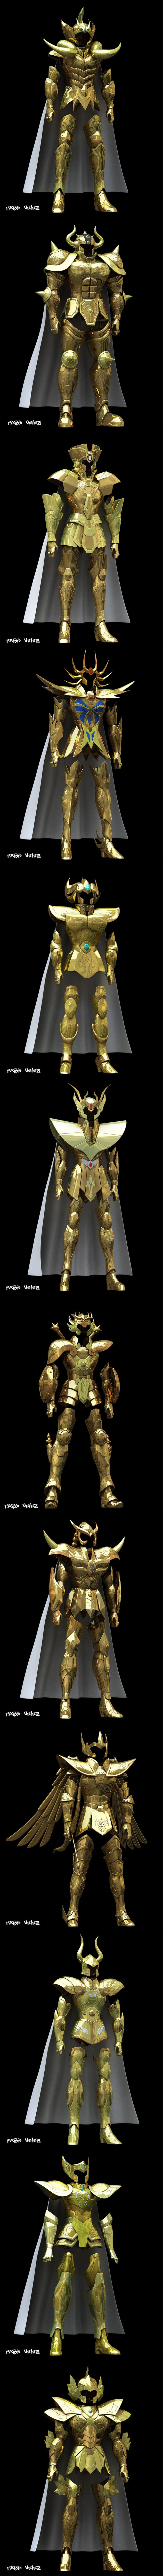 3d CGI Gold Cloths, Saint Seiya